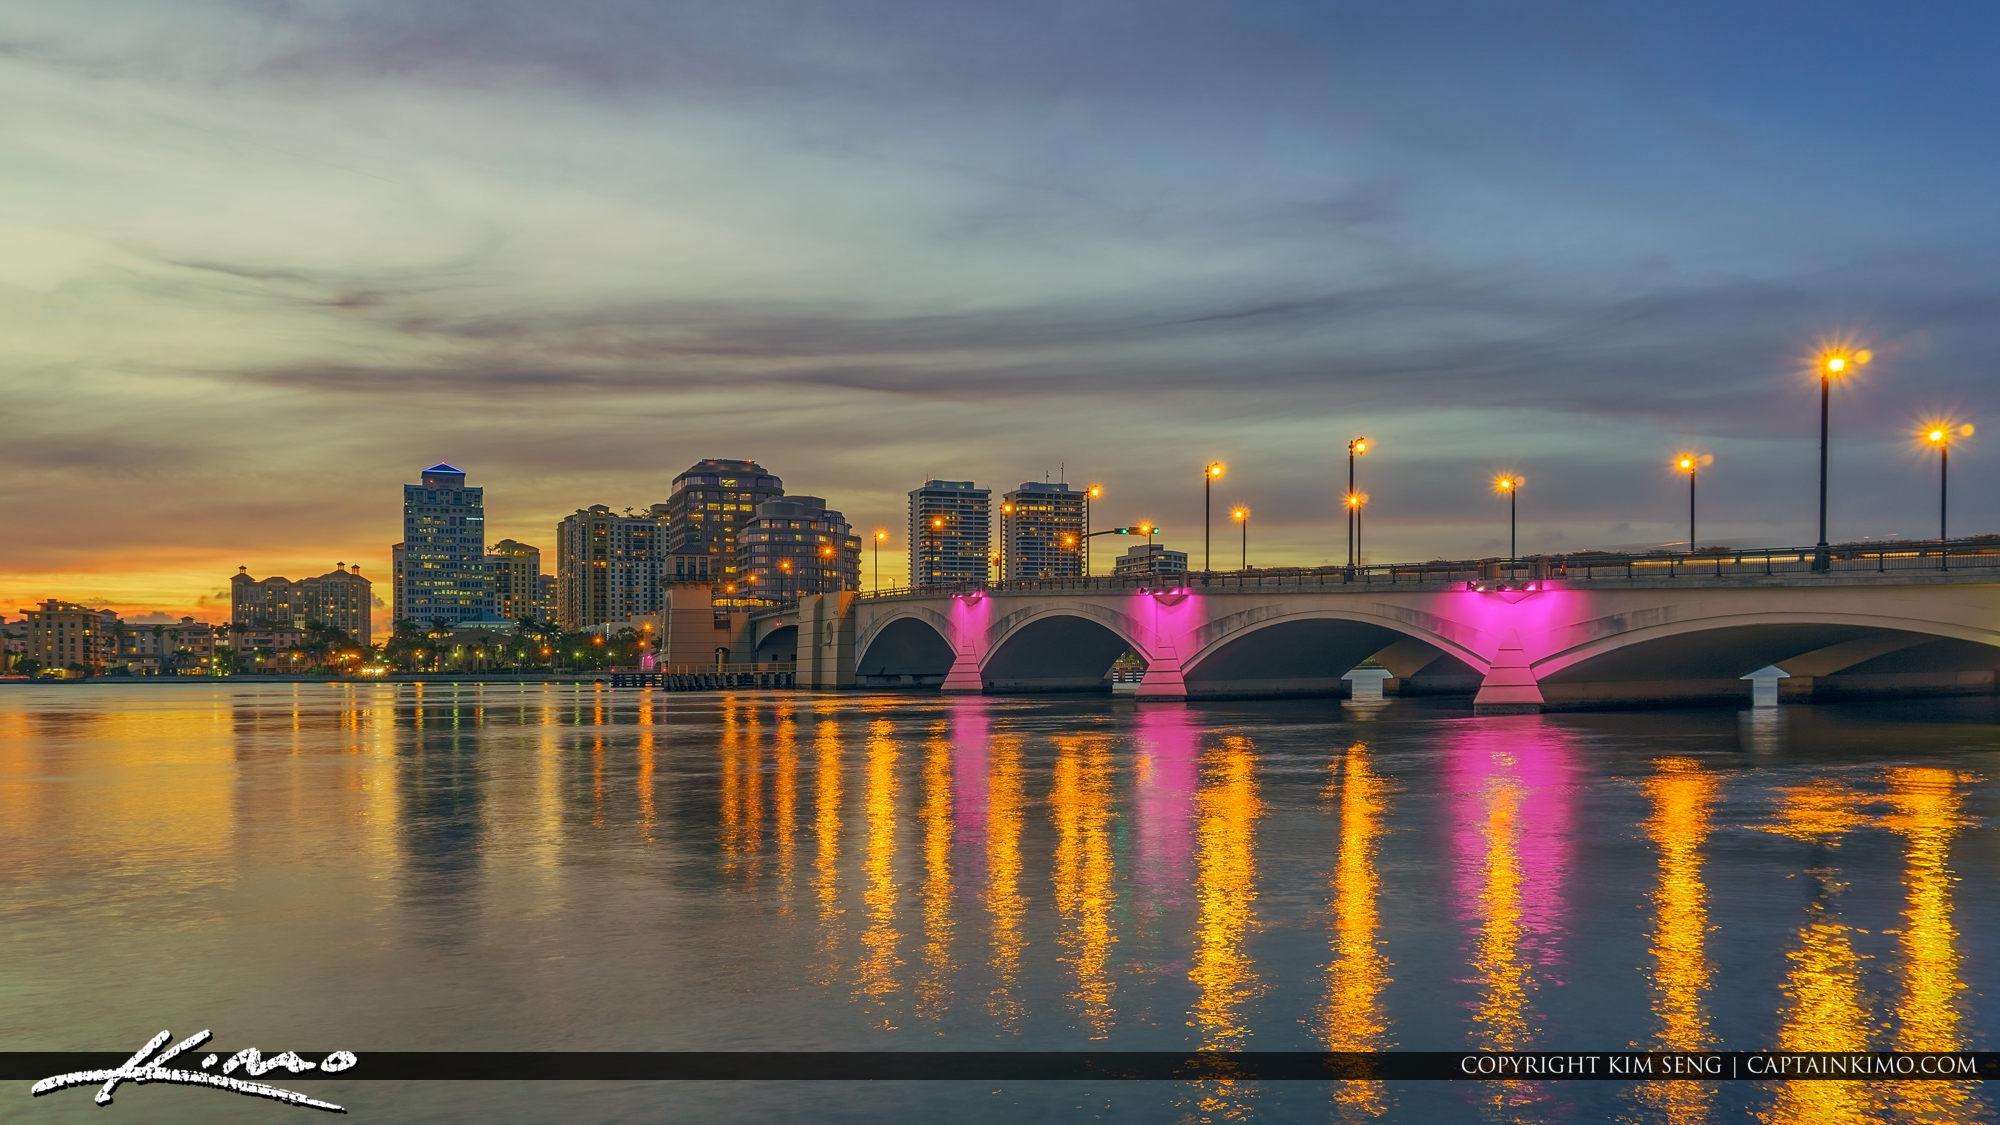 West Palm Beach Skyline After Sunset at Royal Park Bridge